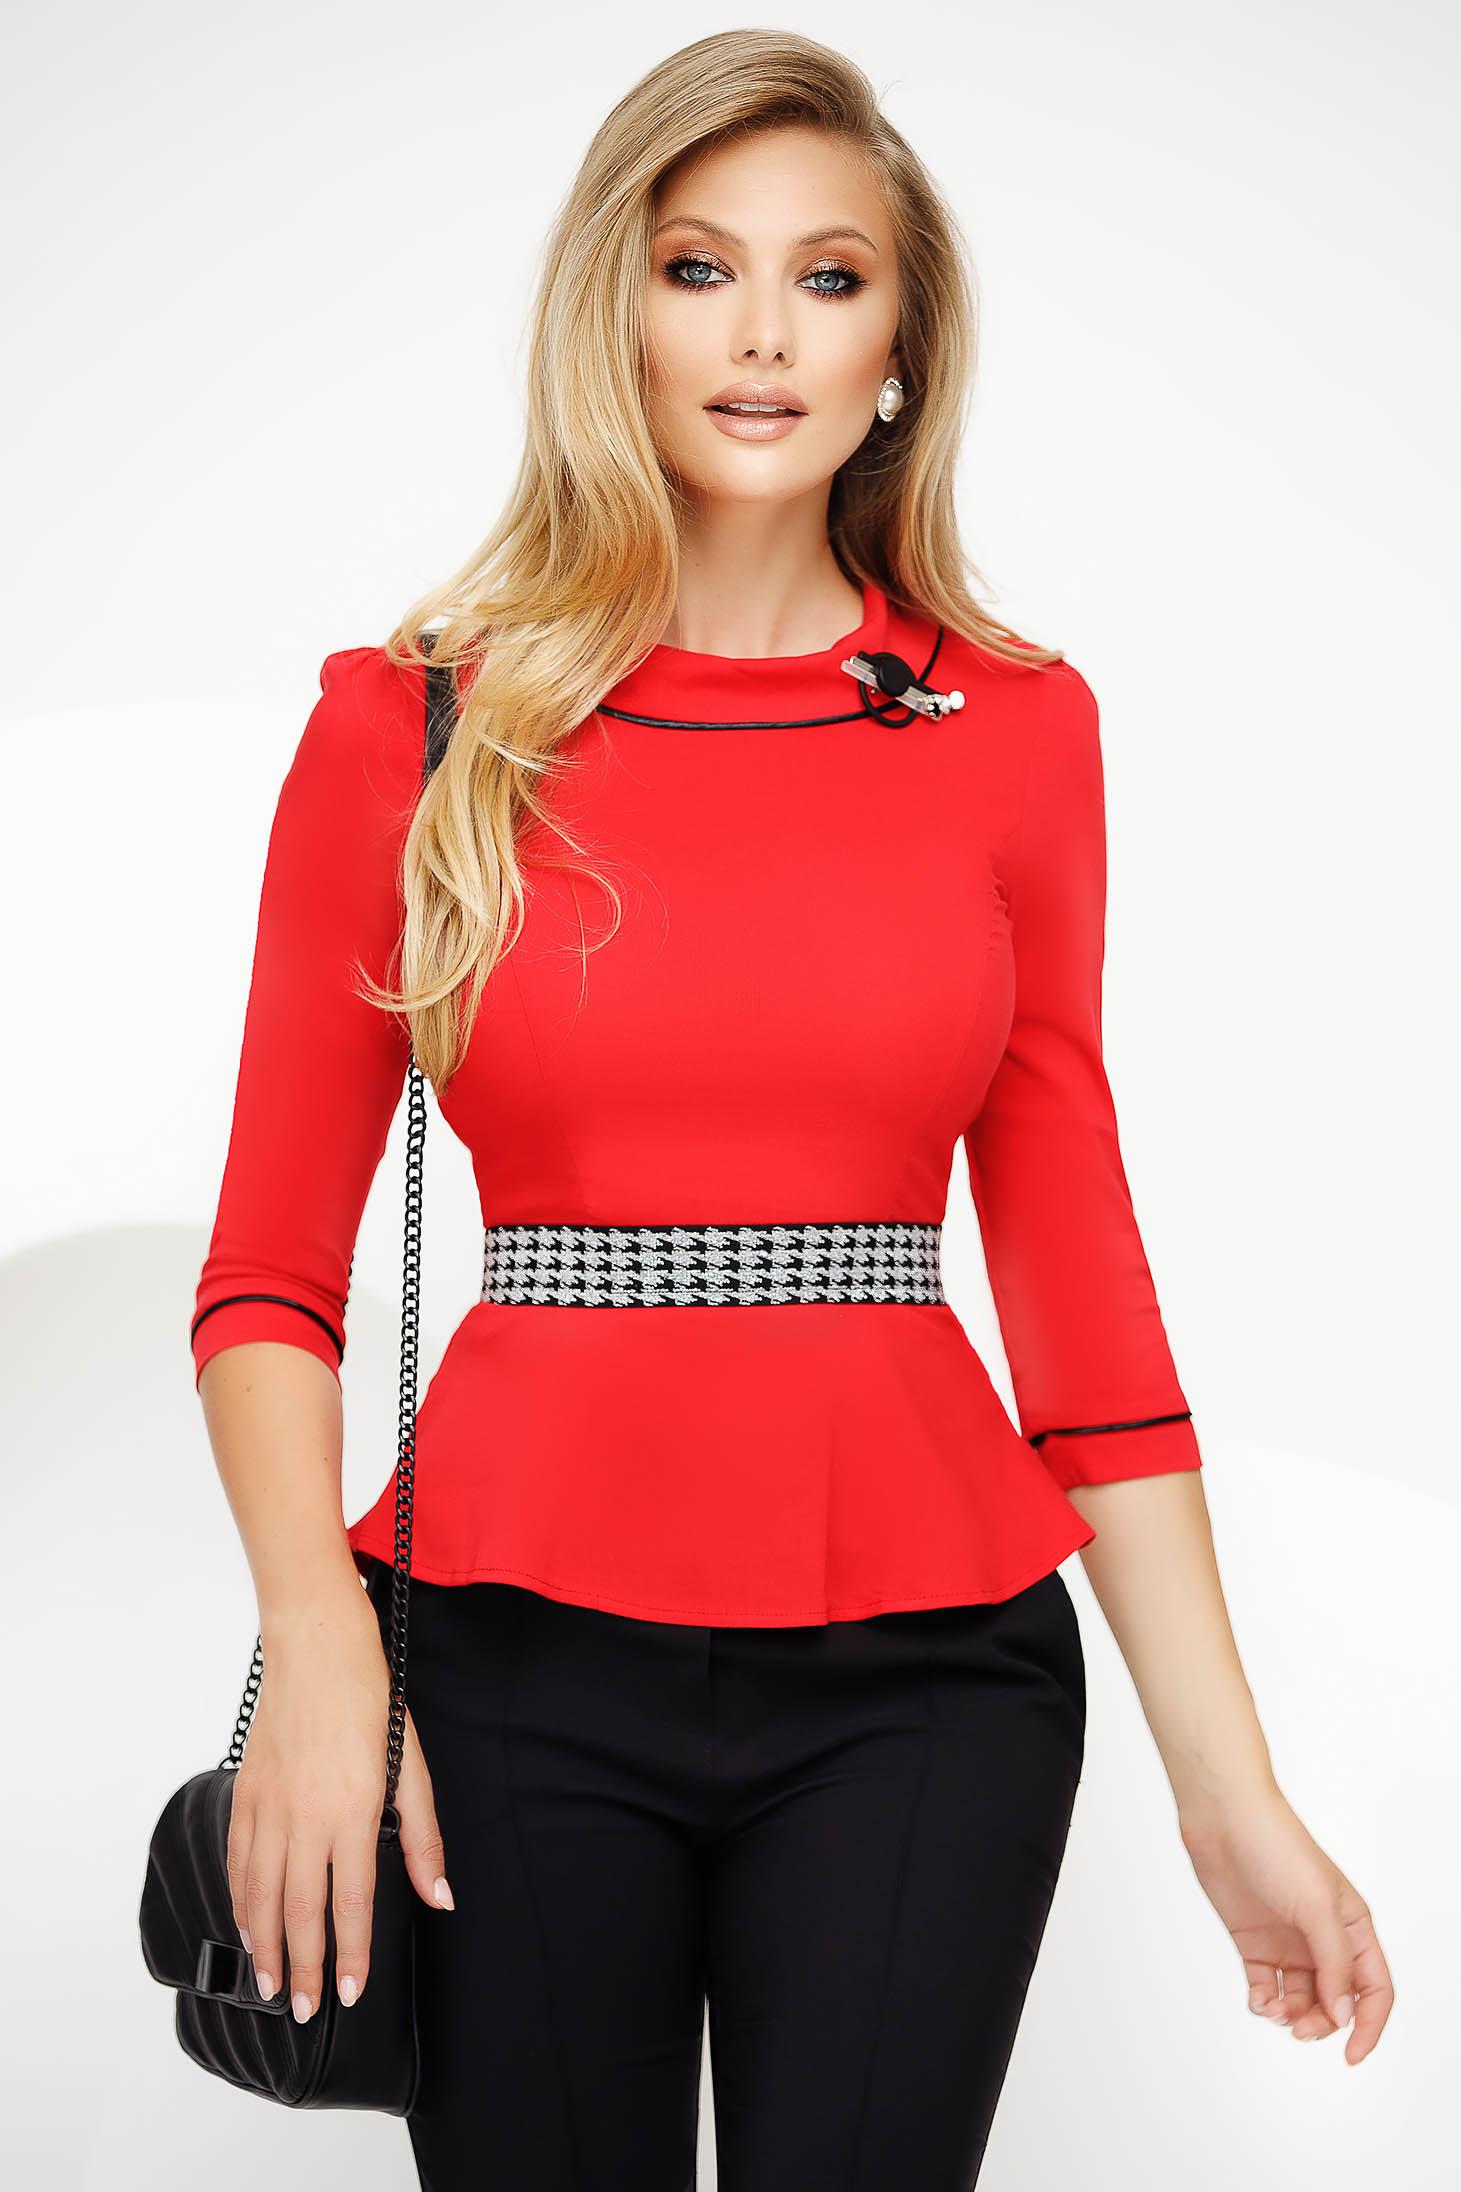 Camasa dama Fofy rosie office din bumbac usor elastic cu un croi mulat cu peplum